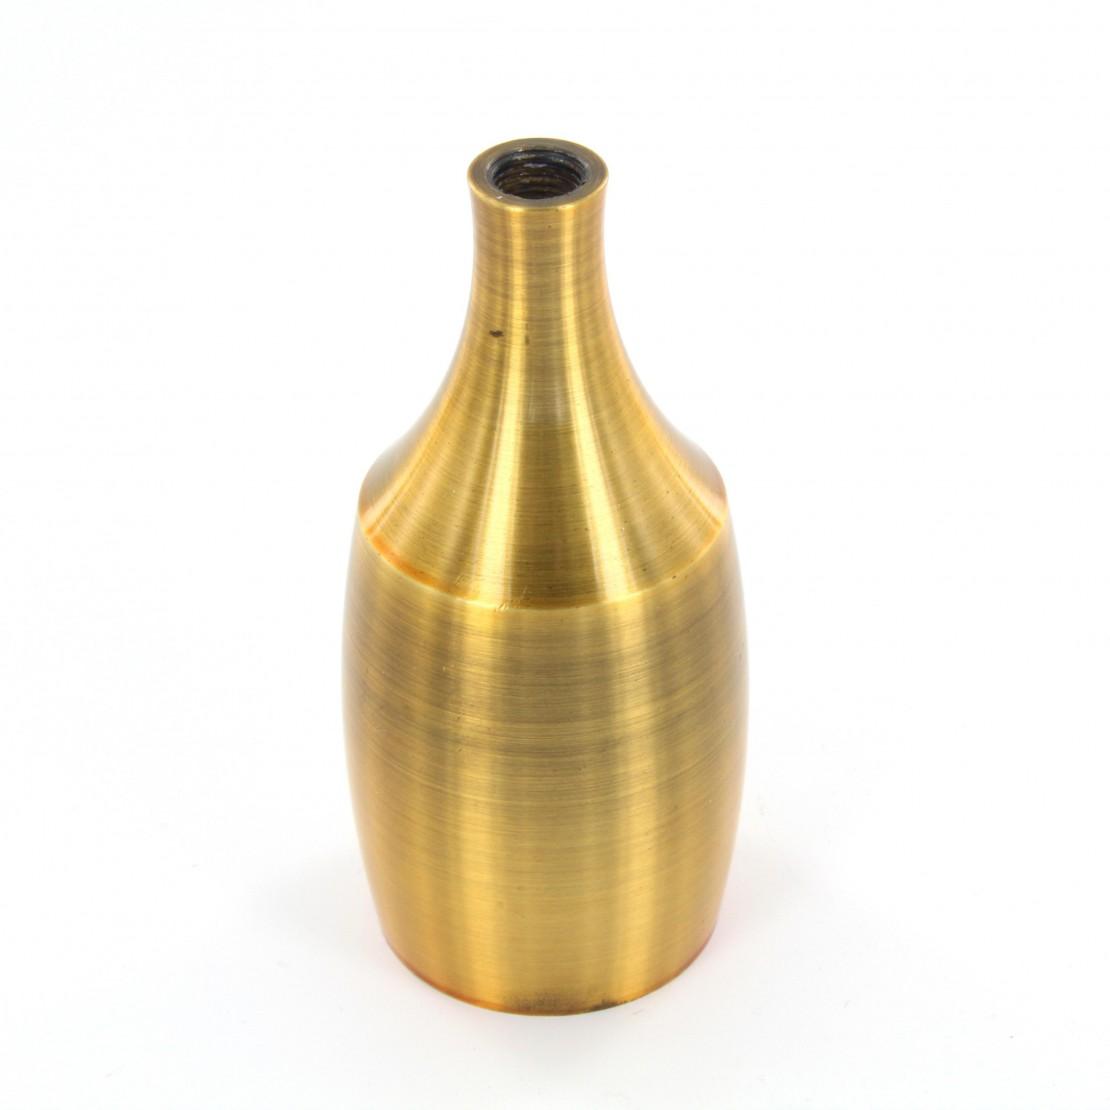 Douille métallique or